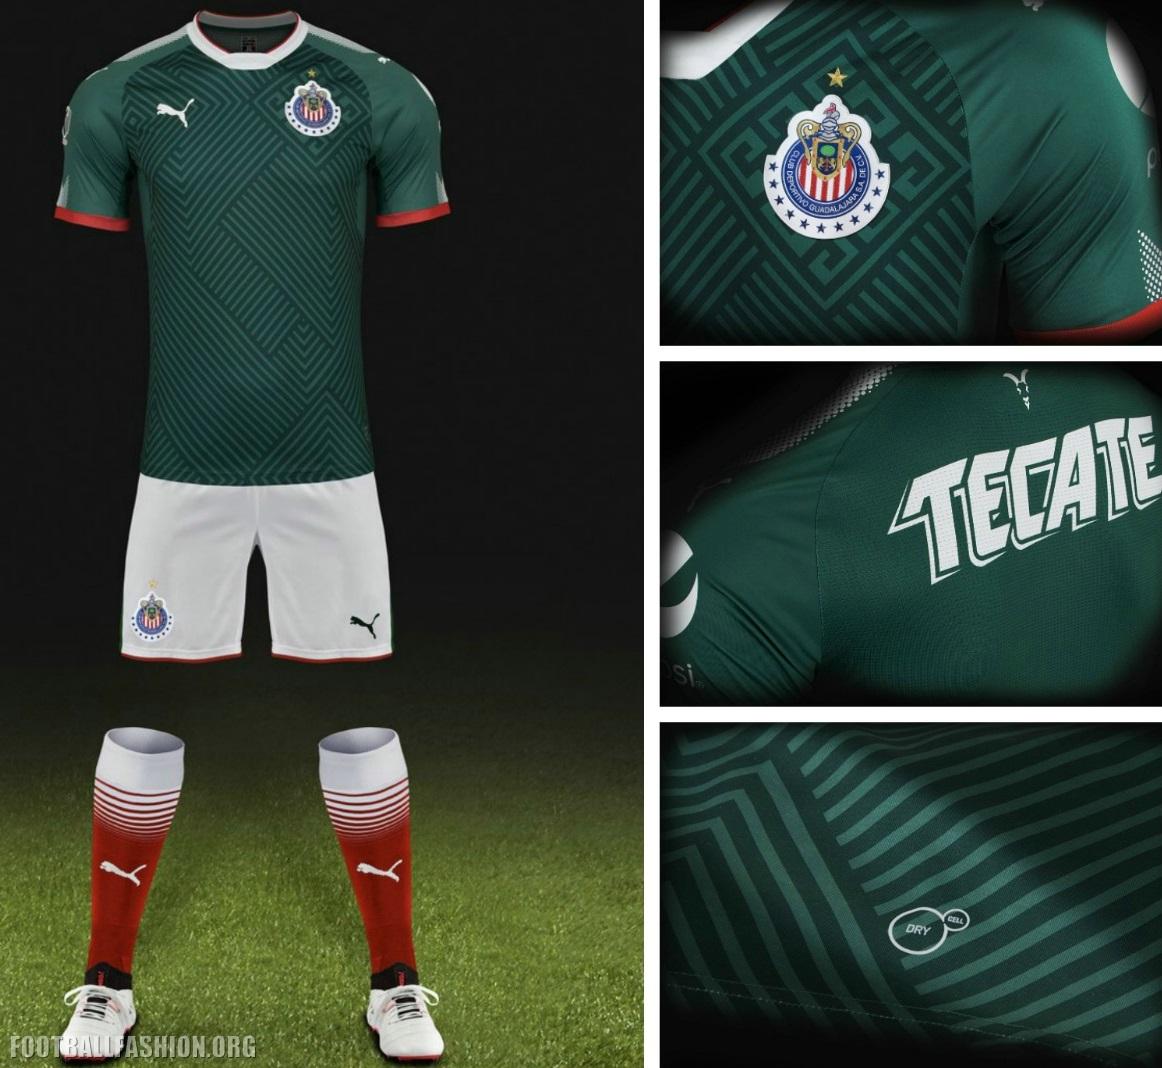 f8dd964e9 Chivas de Guadalajara 2017 18 PUMA Third Jersey - FOOTBALL FASHION.ORG